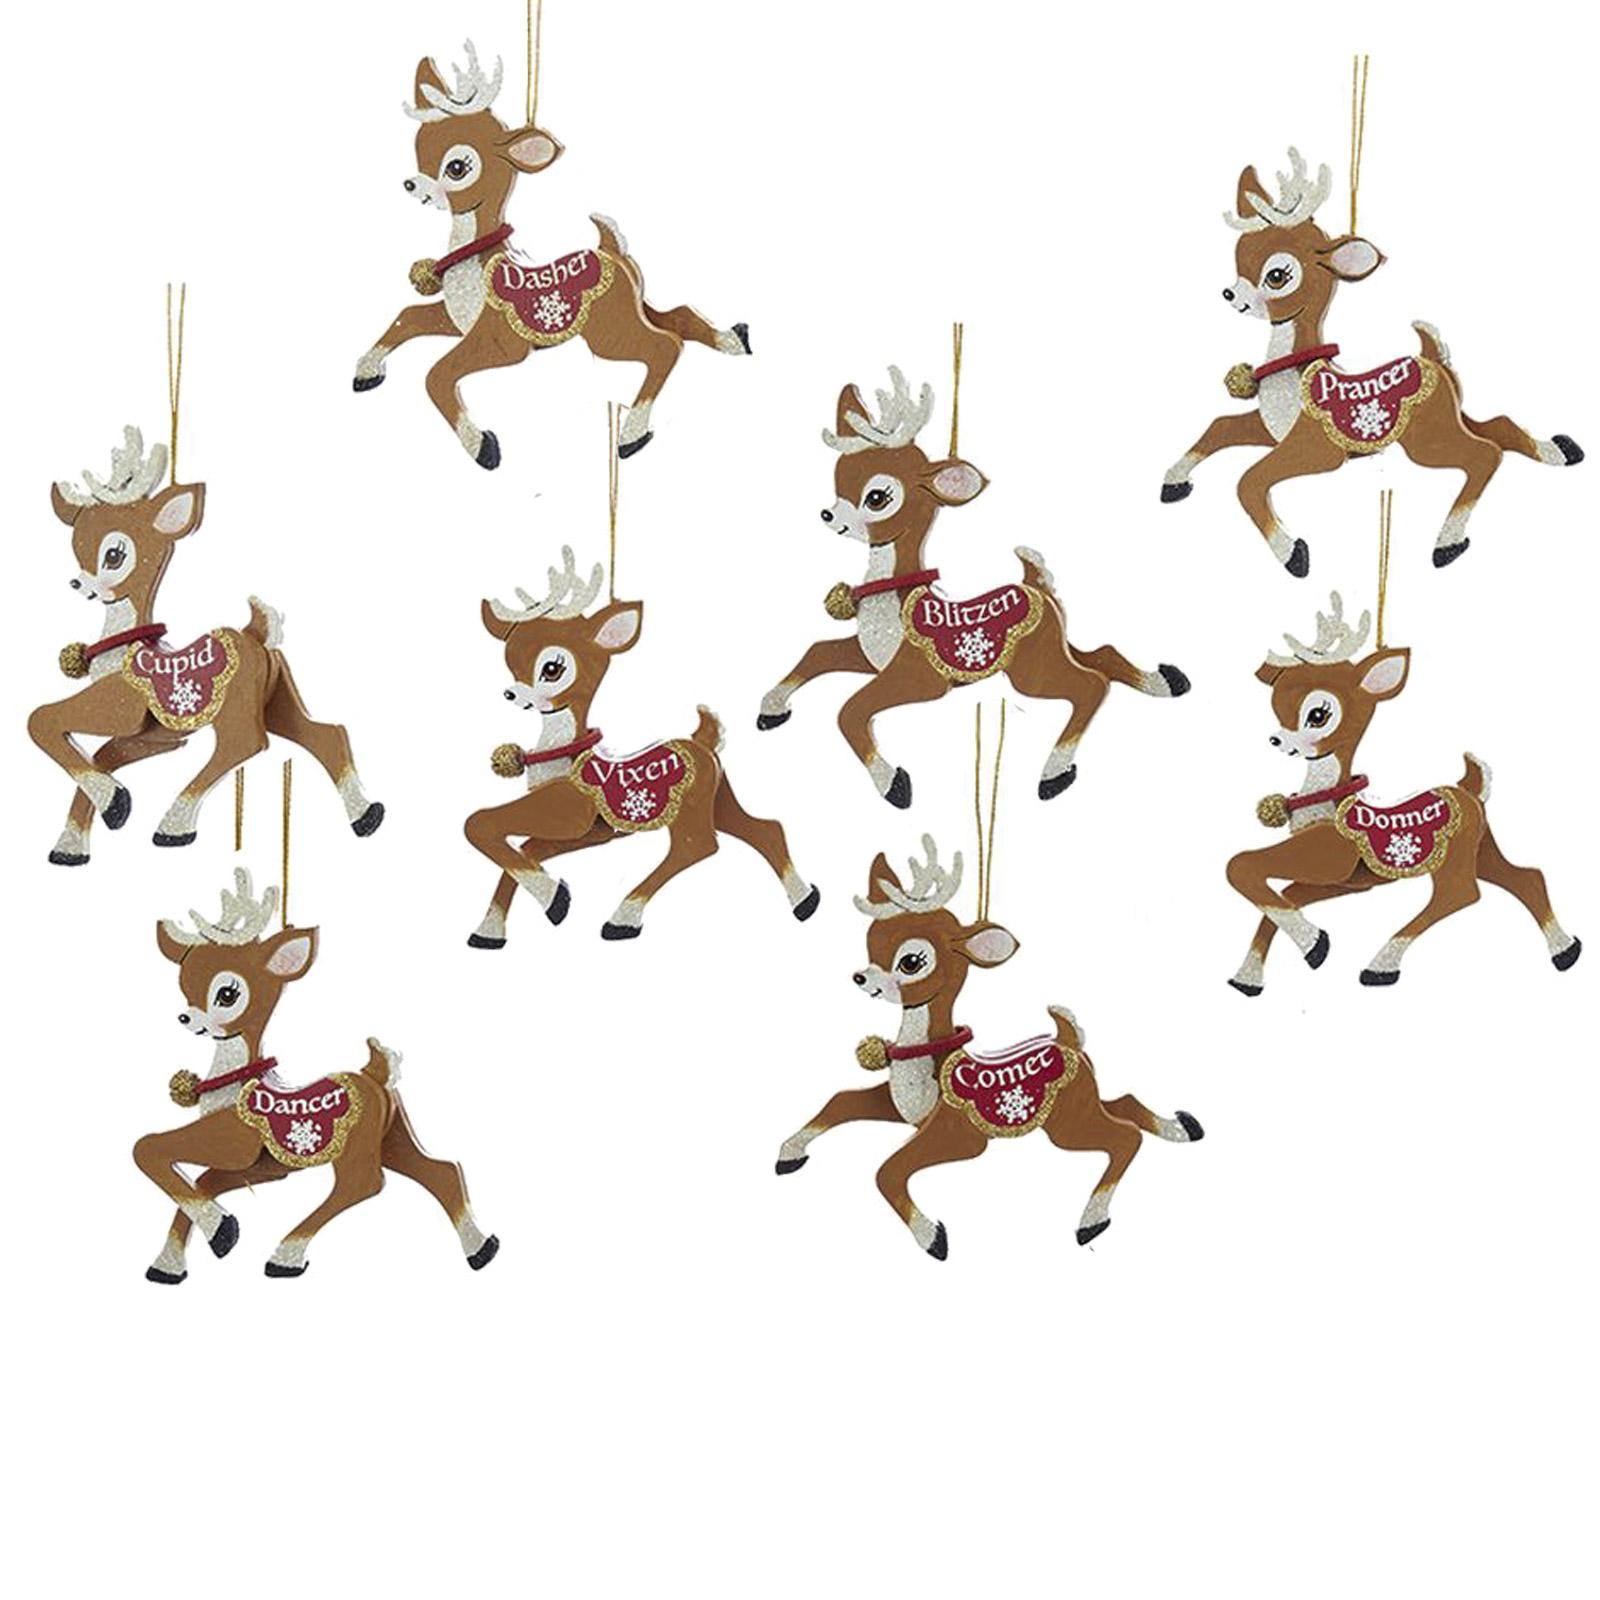 Christmas Decorations Santa Clarita Ca: Kurt Adler Santa's Reindeer Cute Christmas Ornaments